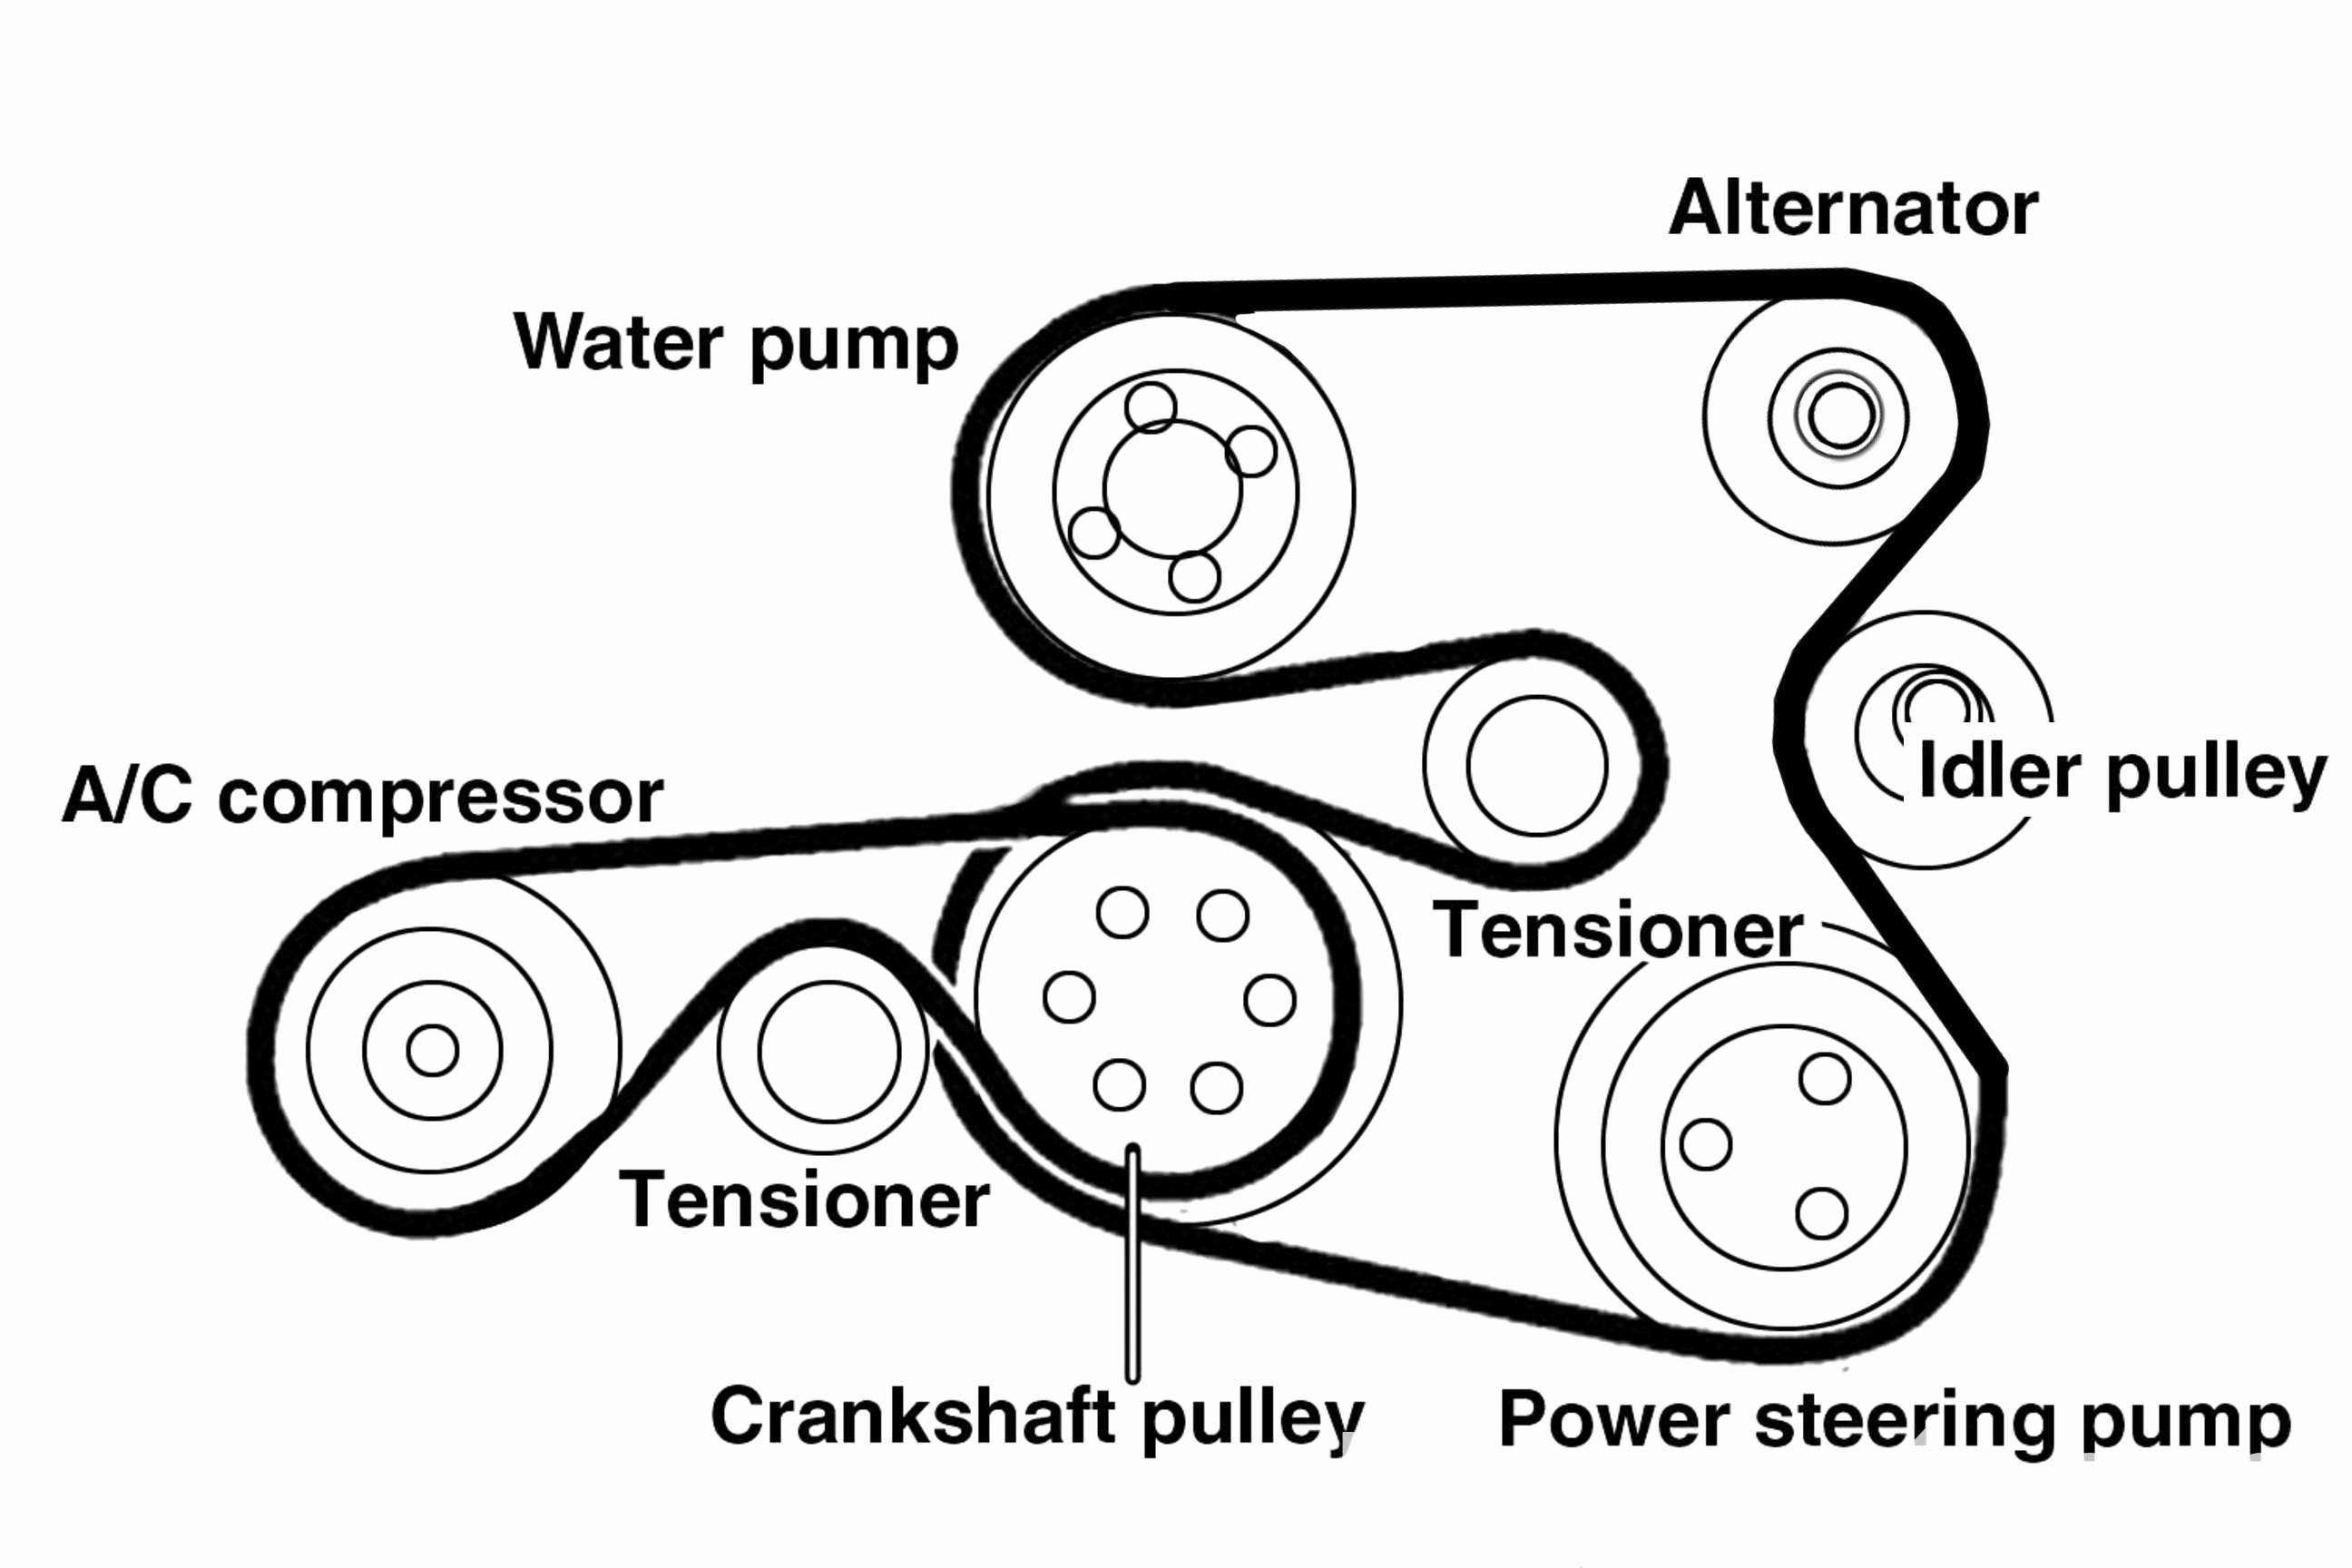 Diagram Of Car Gears Car Engine Belt Diagram 50 Unique Stock 2007 Bmw X3 Serpentine Belt Of Diagram Of Car Gears Car Engine Belt Diagram 50 Unique Stock 2007 Bmw X3 Serpentine Belt